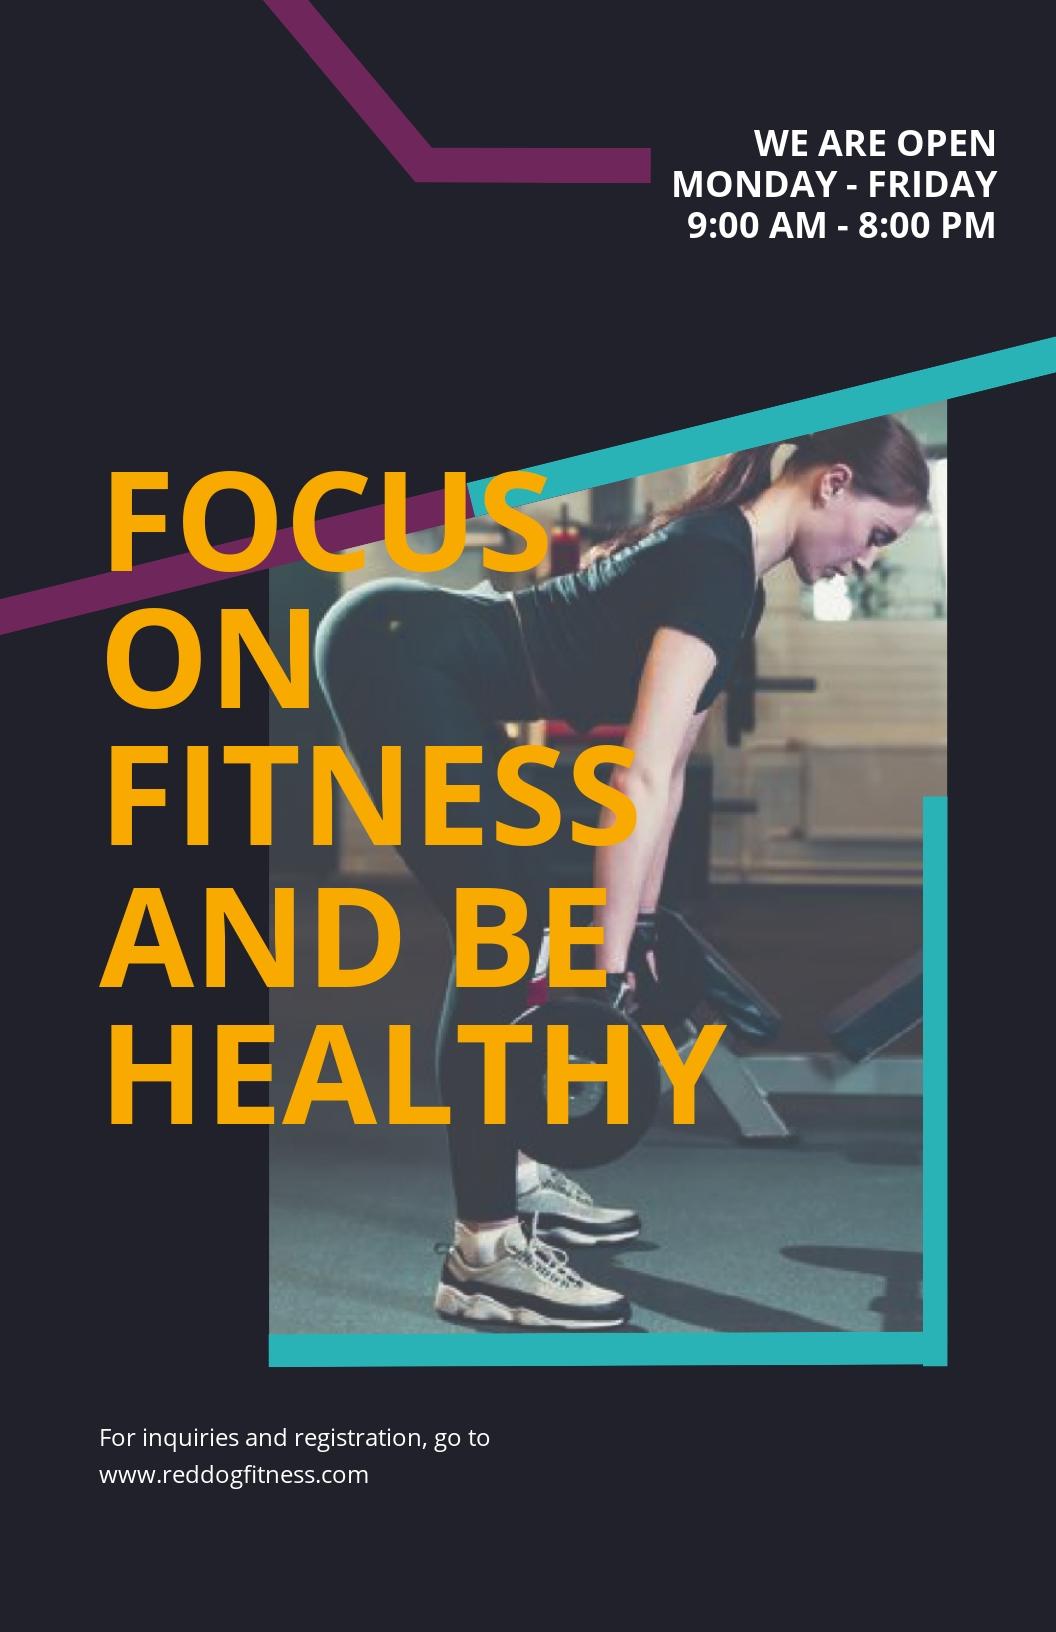 Fitness Motivational Poster Template.jpe